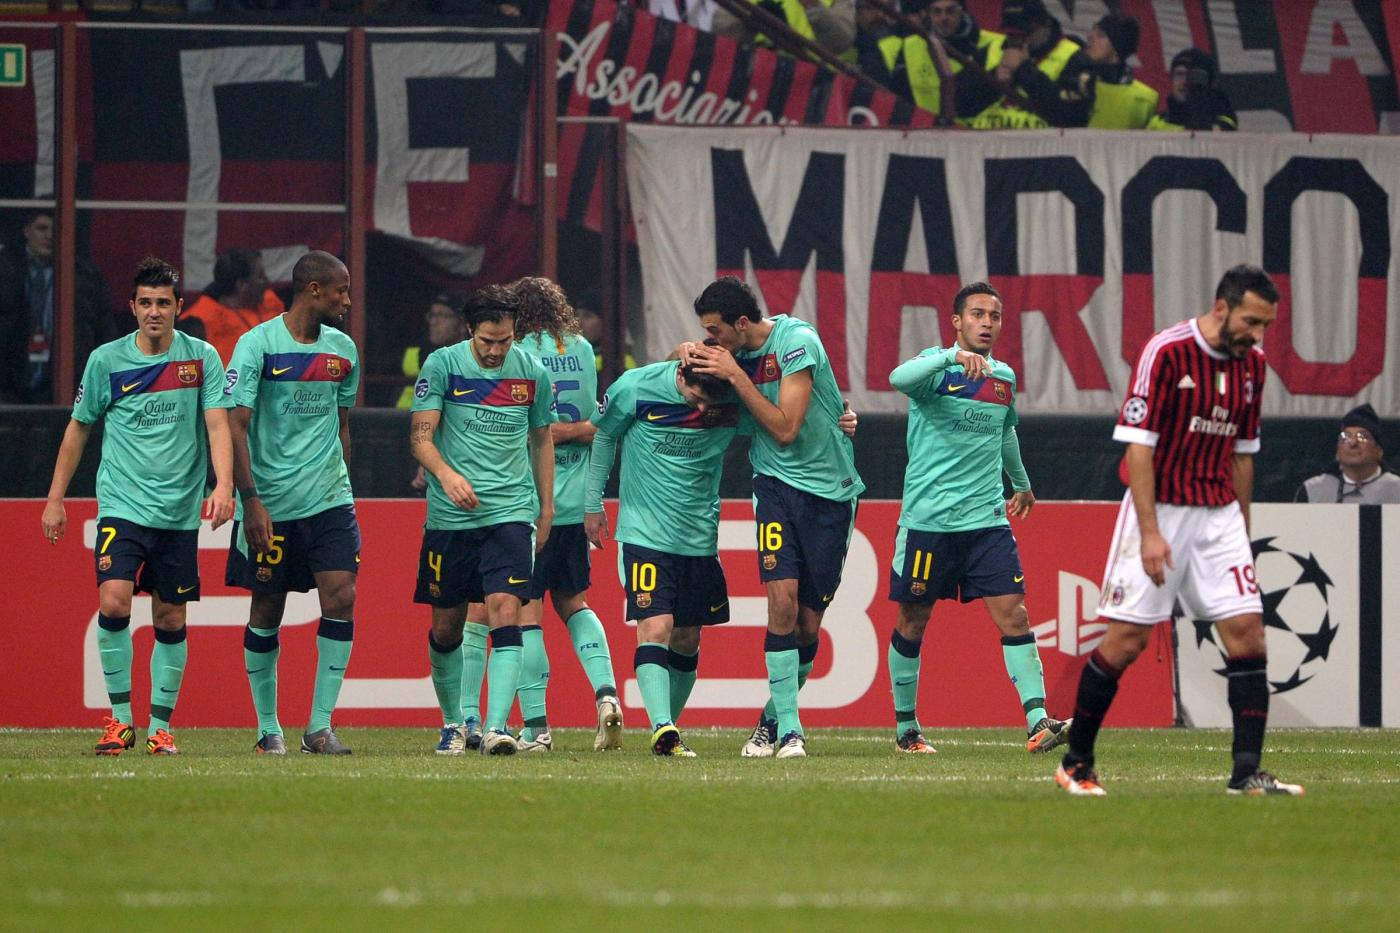 Ascolti tv mercoledì 23 novembre 2011: oltre 6,5 mln per Milan-Barça,